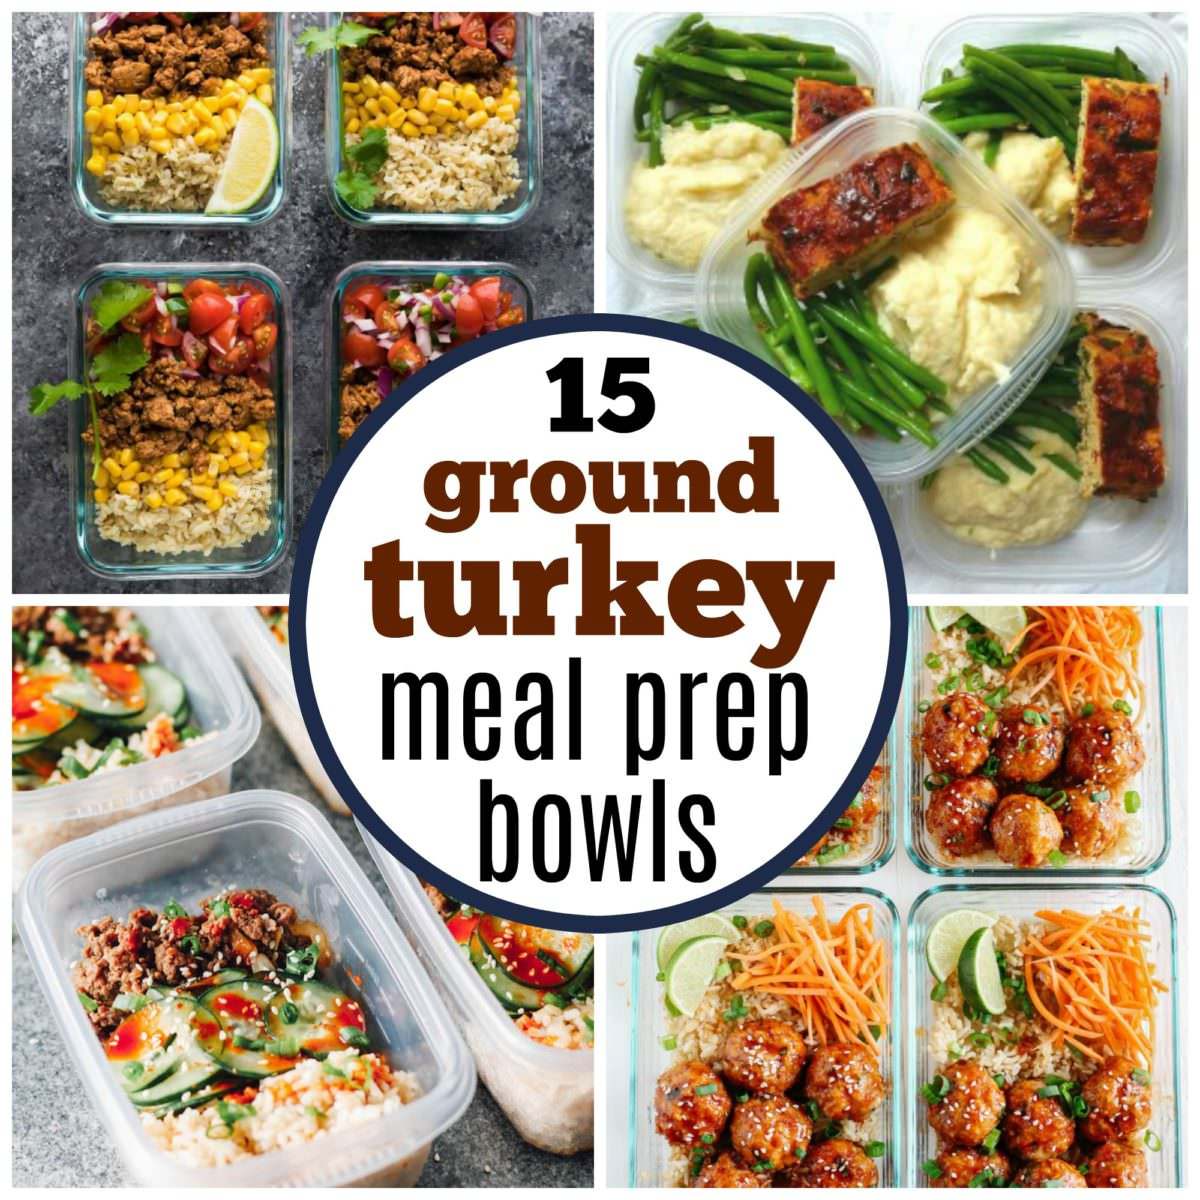 ground turkey meal prep bowls